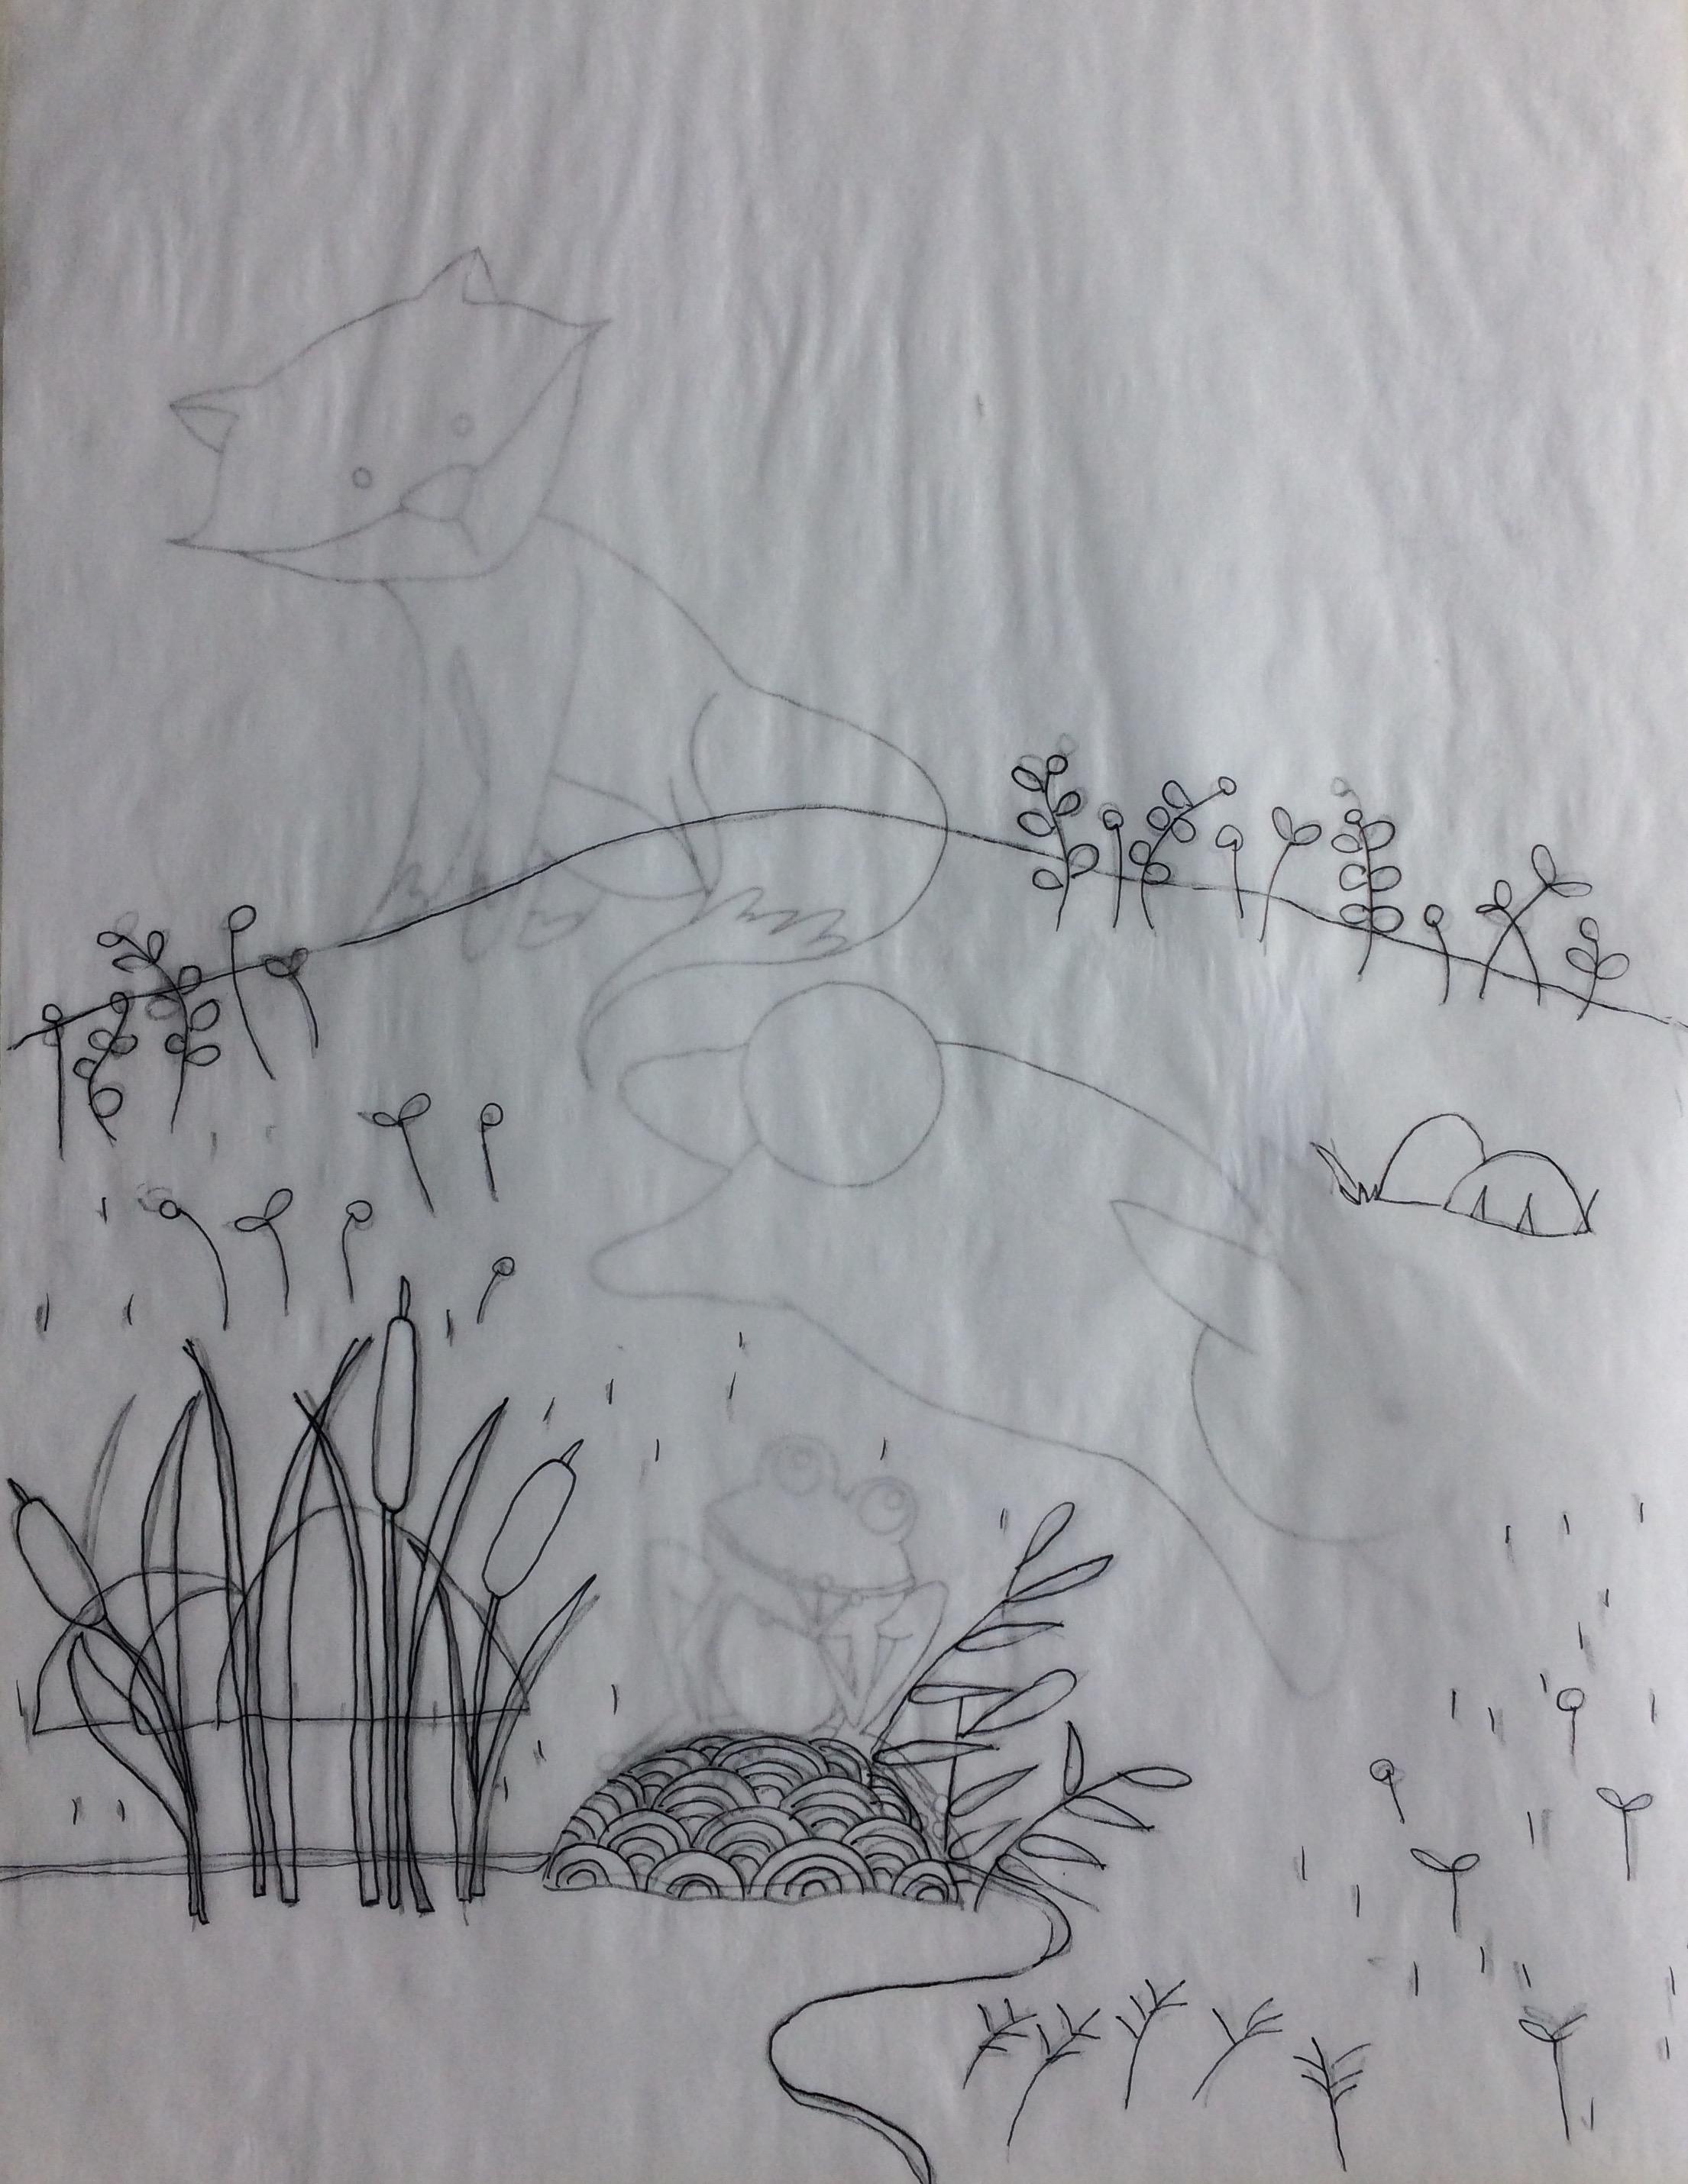 scenery drawn separate